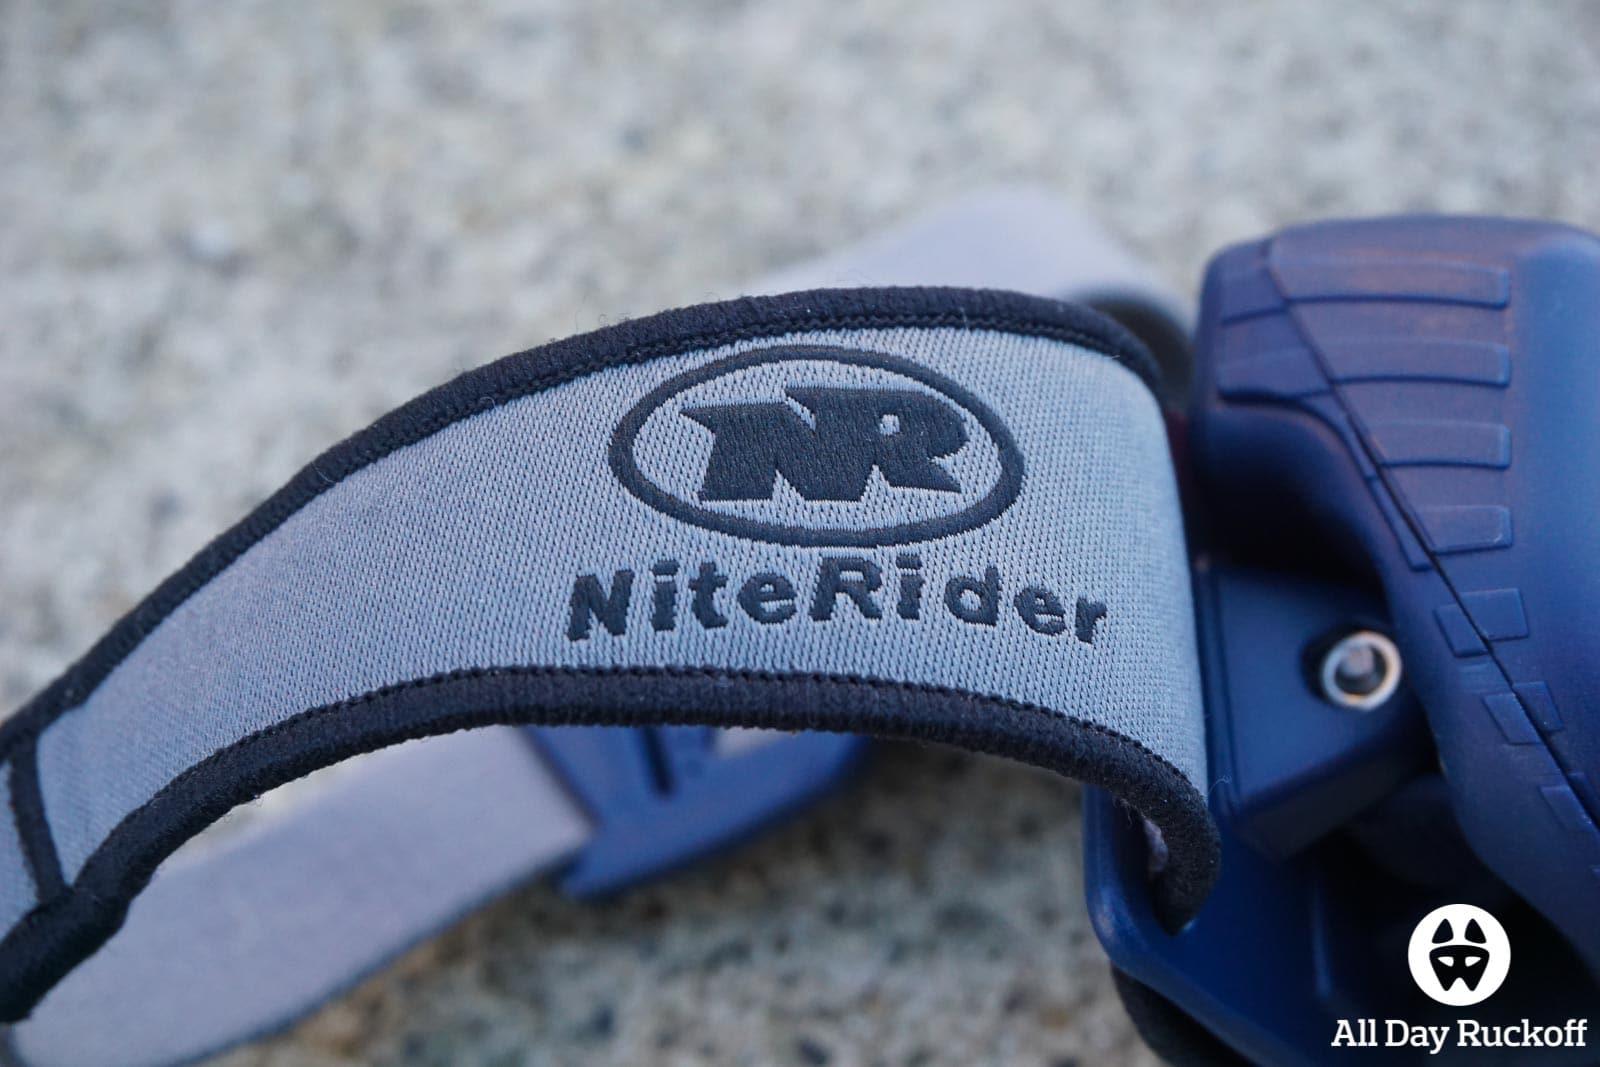 NiteRider Adventure 180 - Band Name